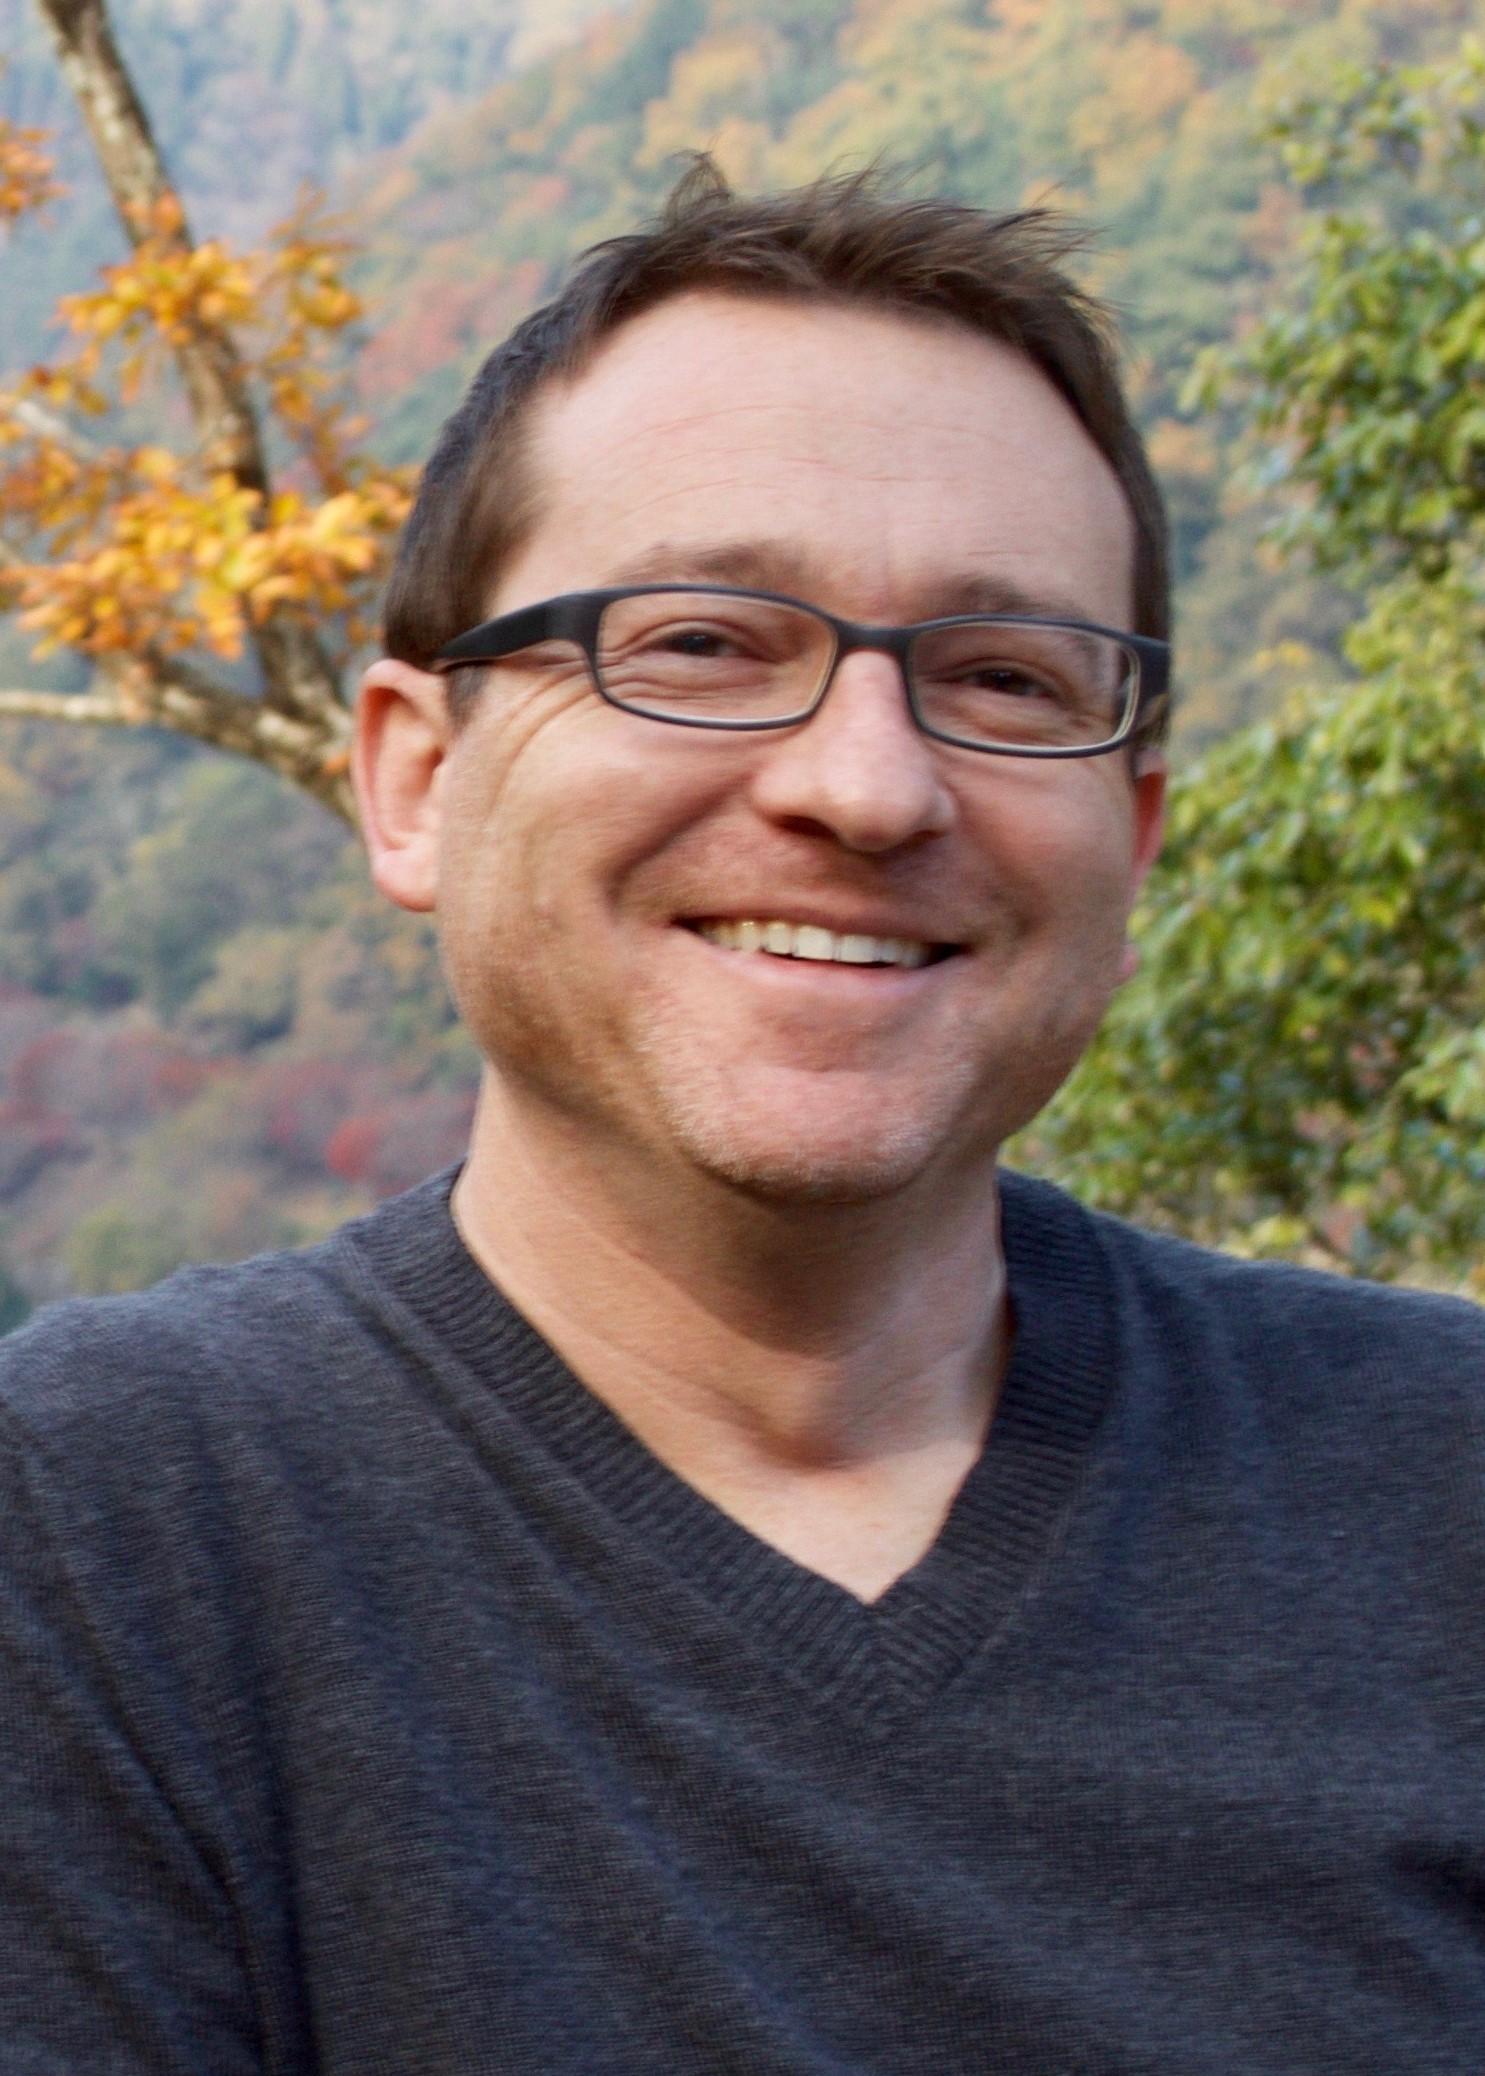 W. Benjamin Goodman, PhD